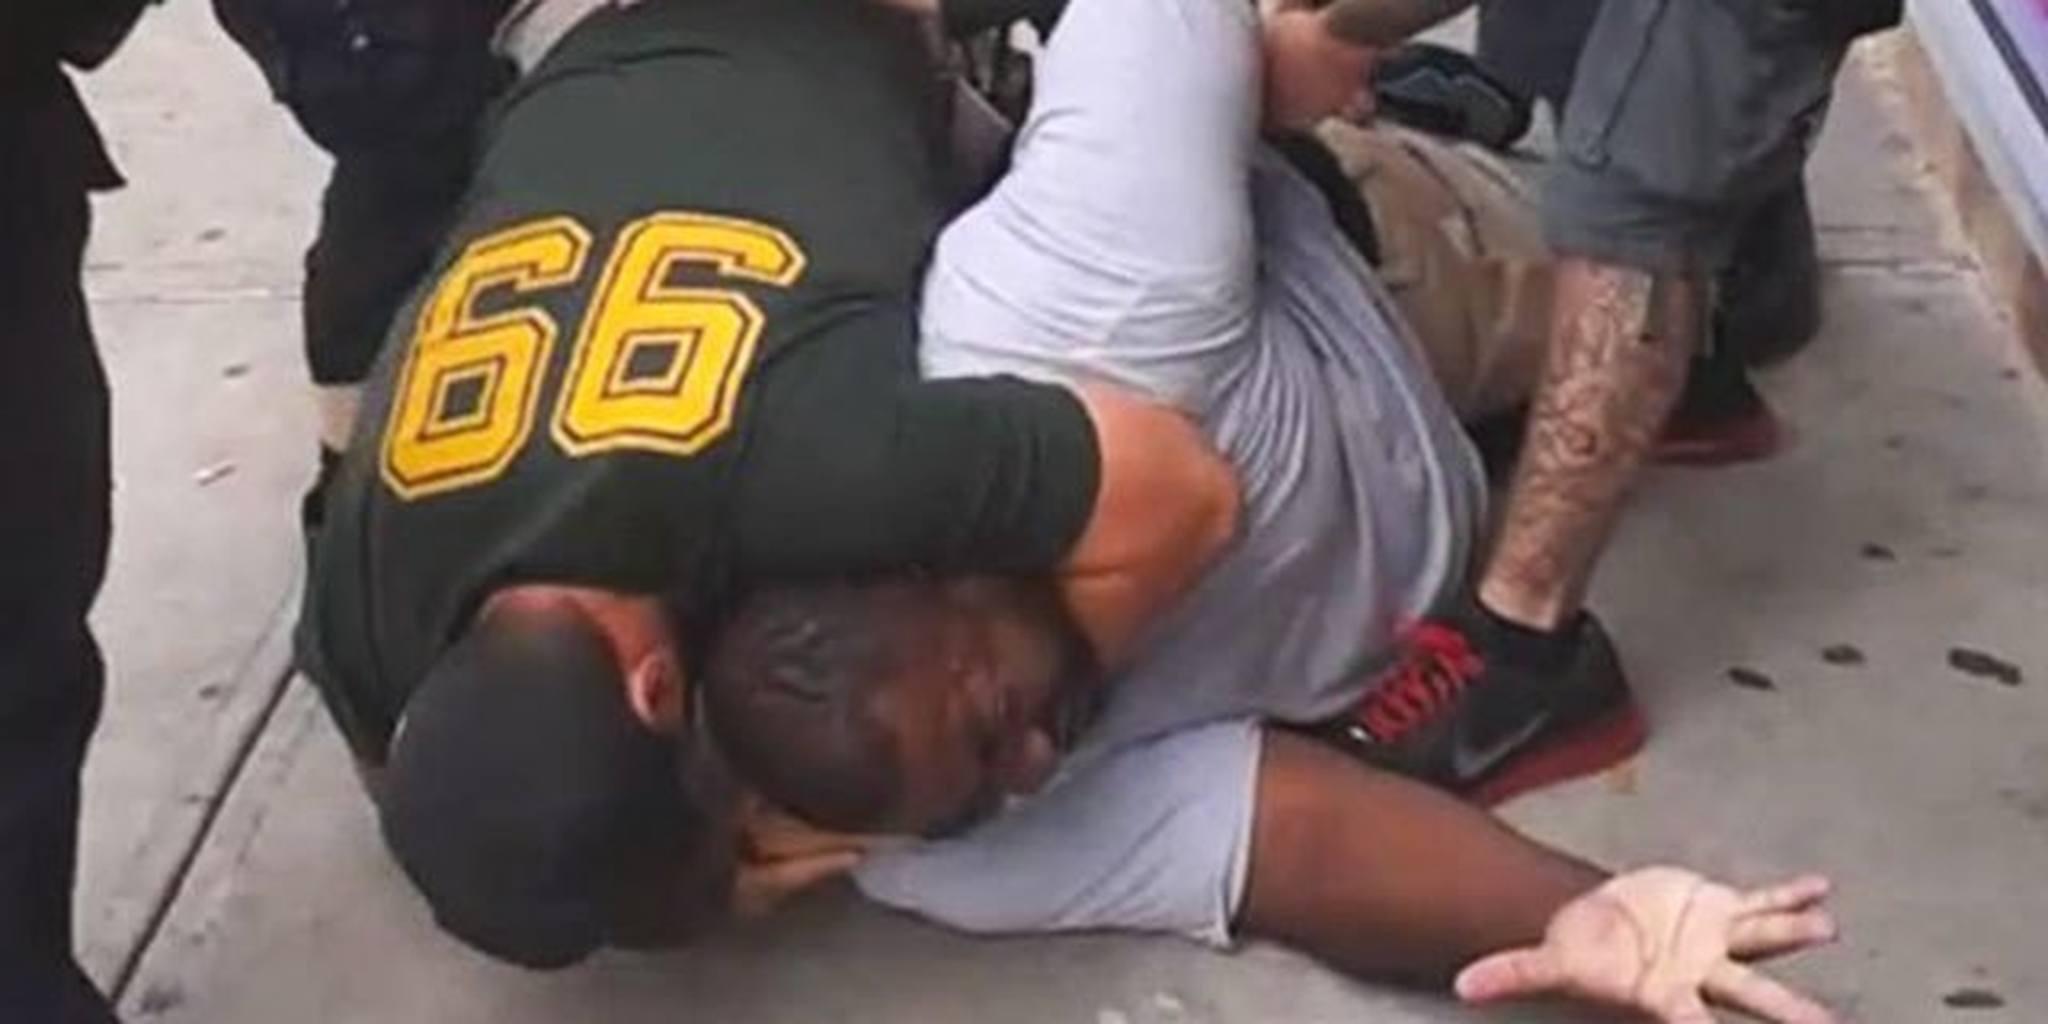 Eric Garner in Chokehold by Daniel Pantaleo